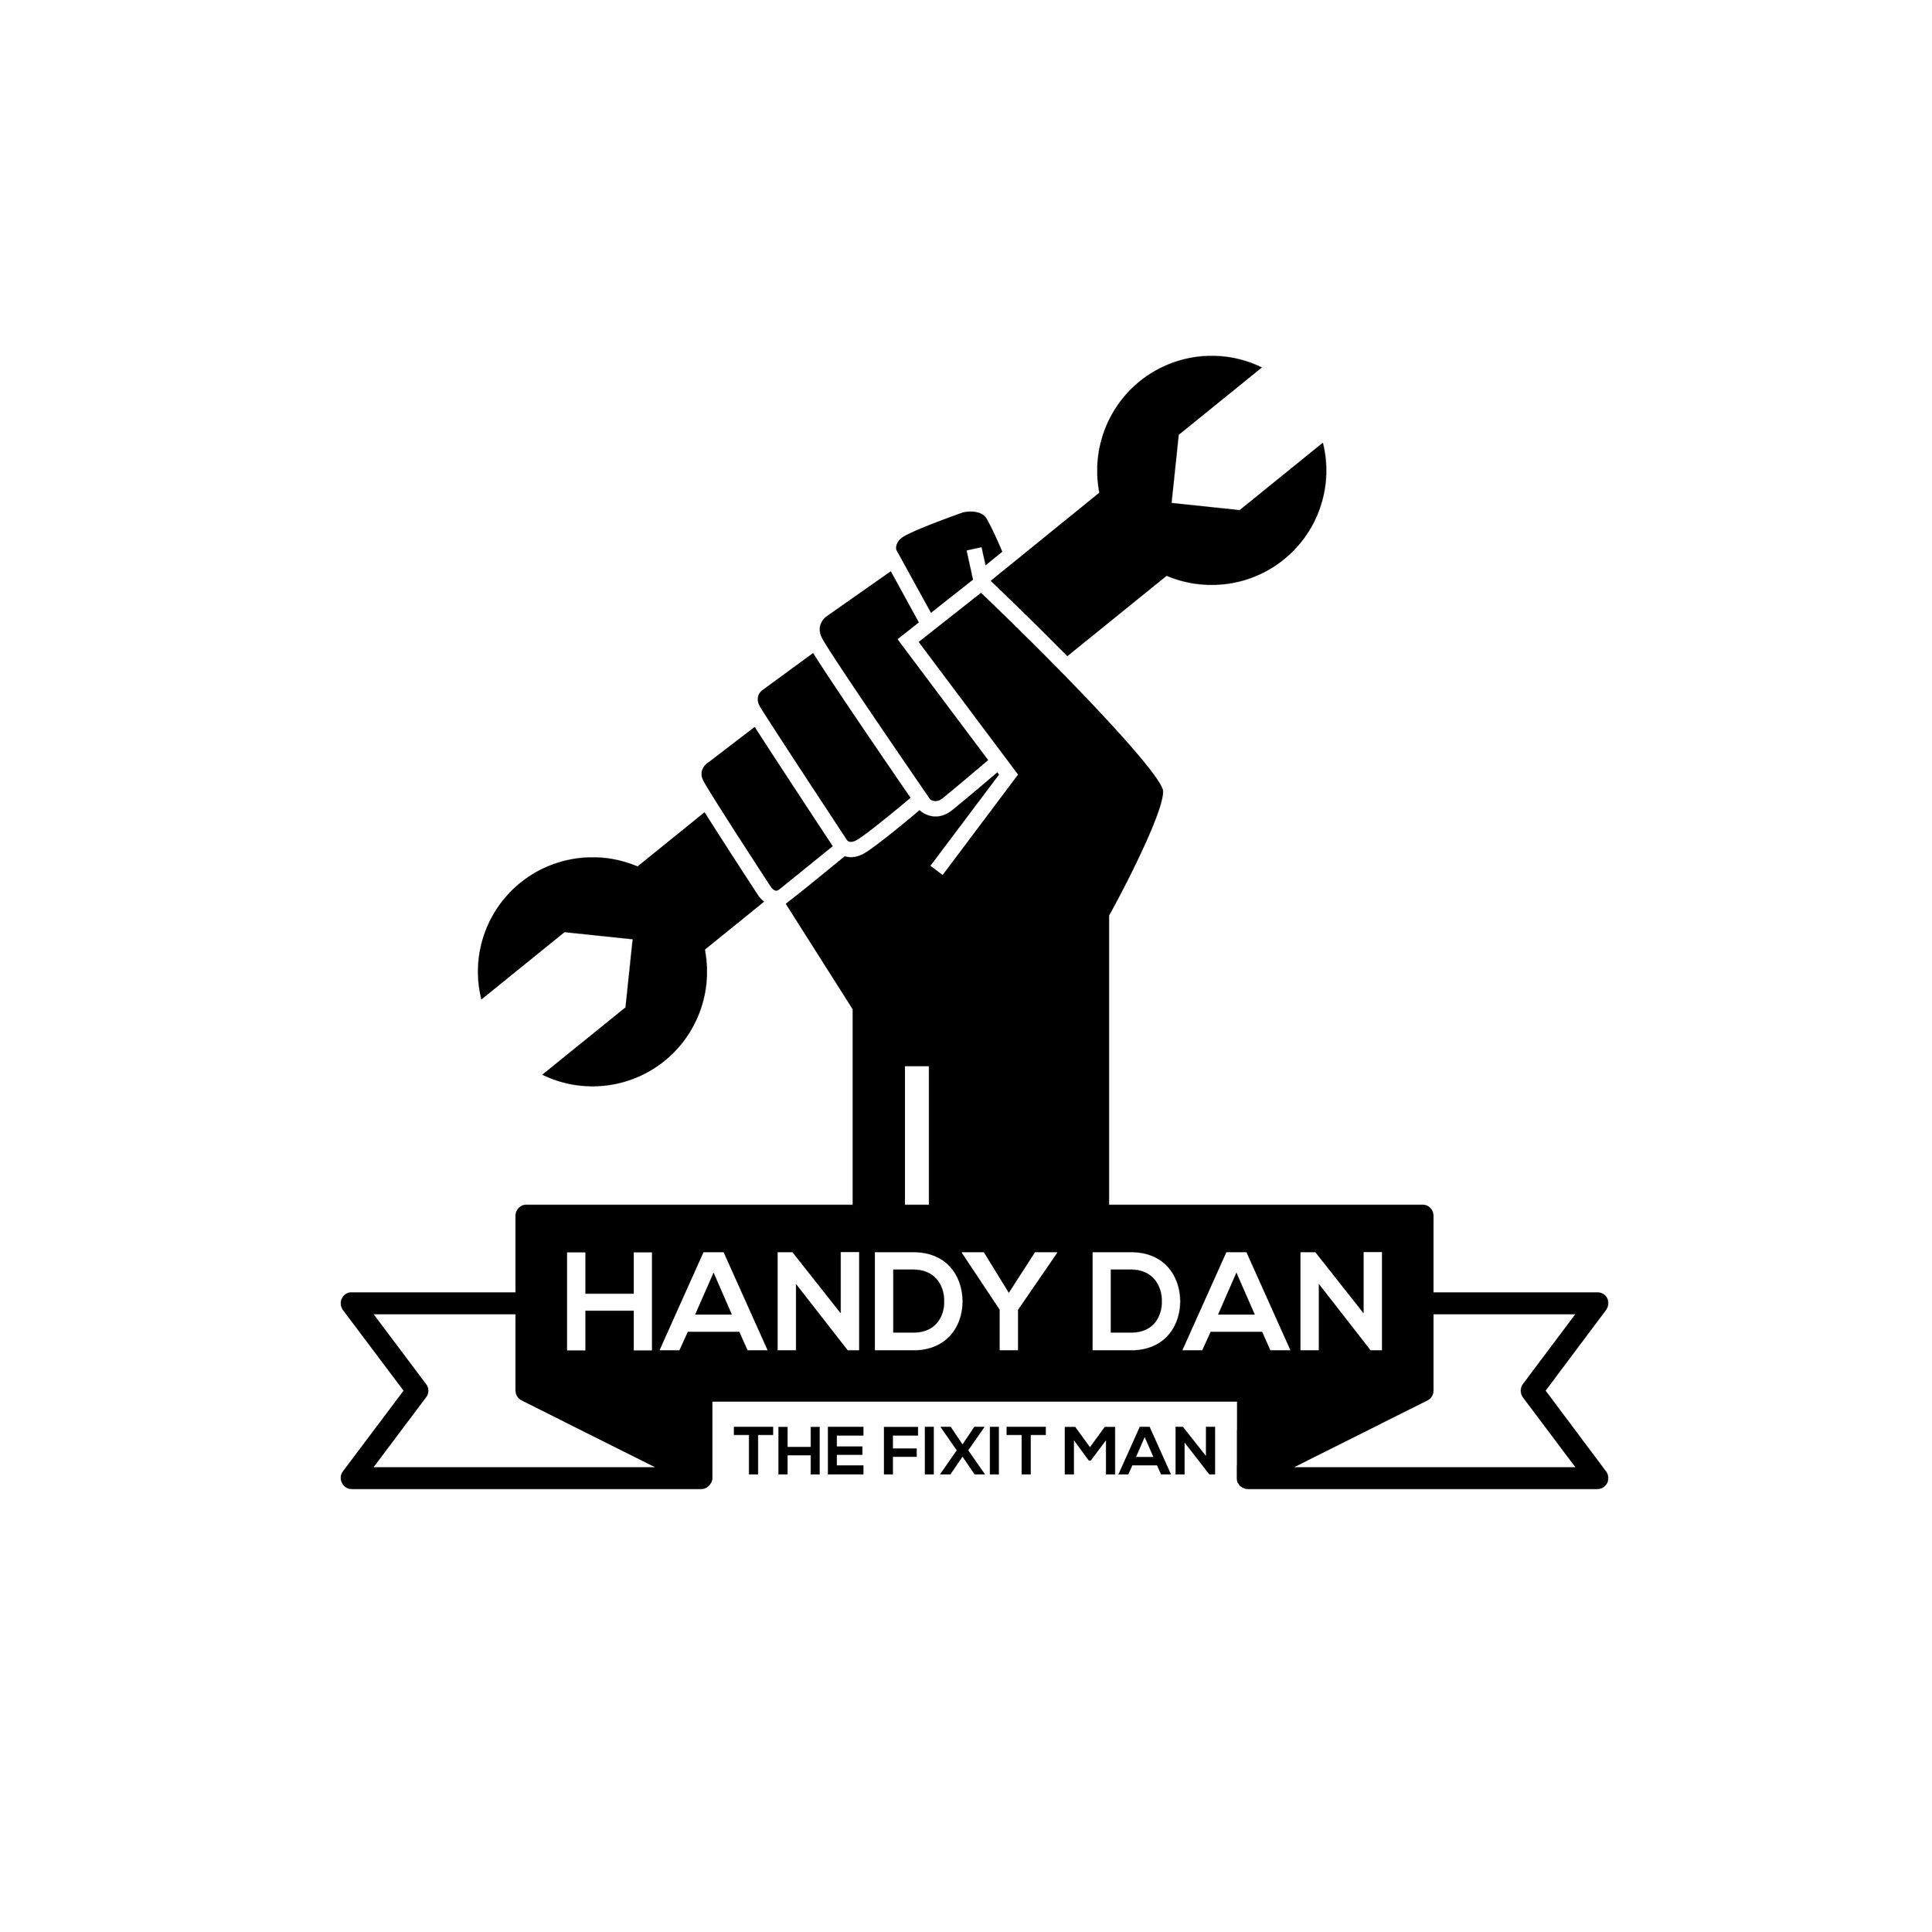 handy-dan-the-fixit-man-logo-2019-bow-sm.jpg